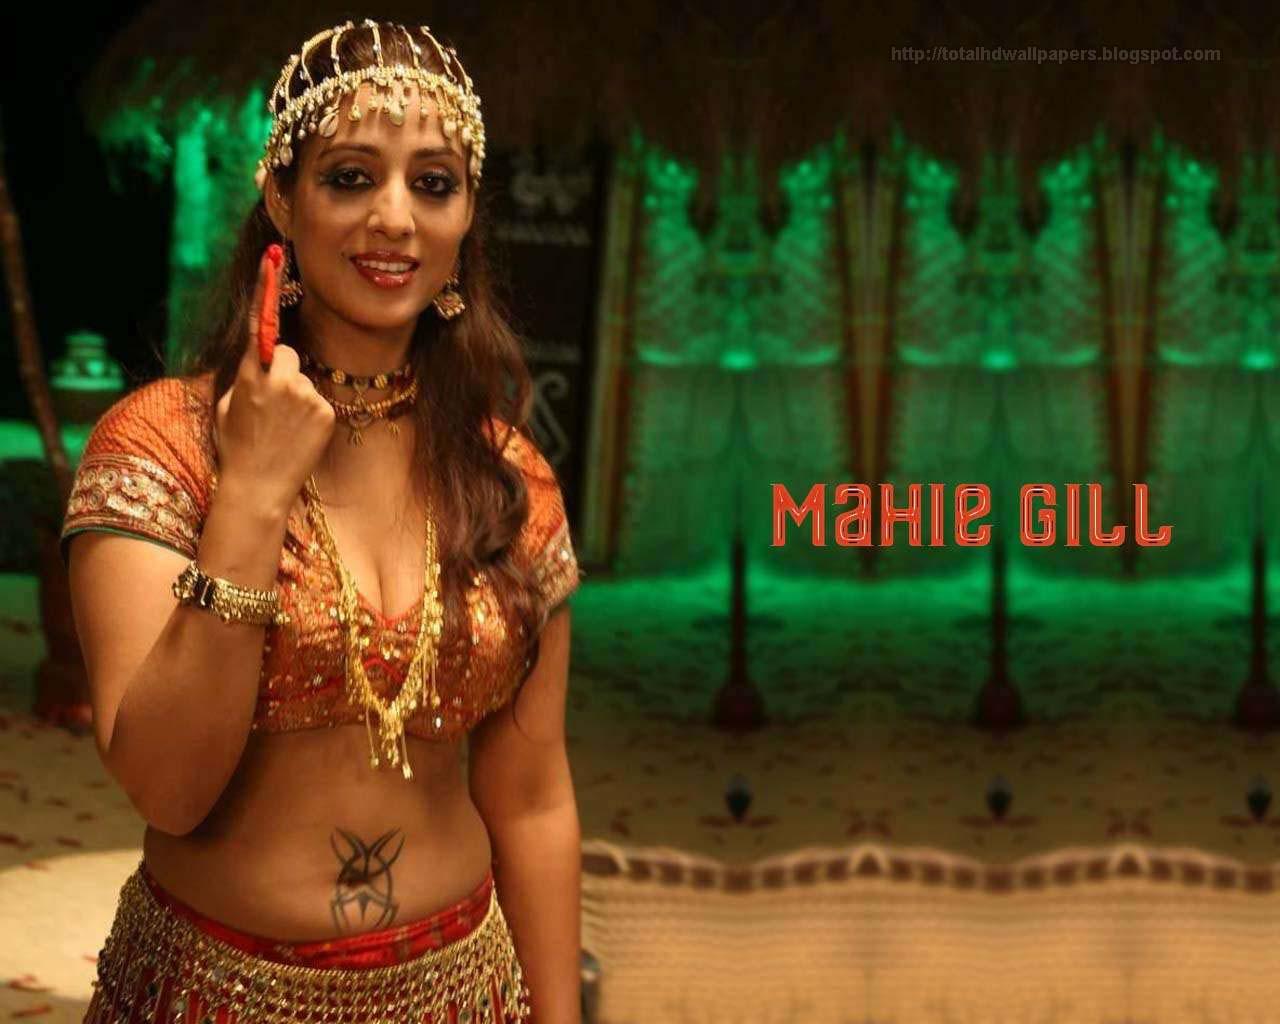 Mahi mahi wallpaper as desktop backgrounds - Mahi Gill Wallpapers Hd 3